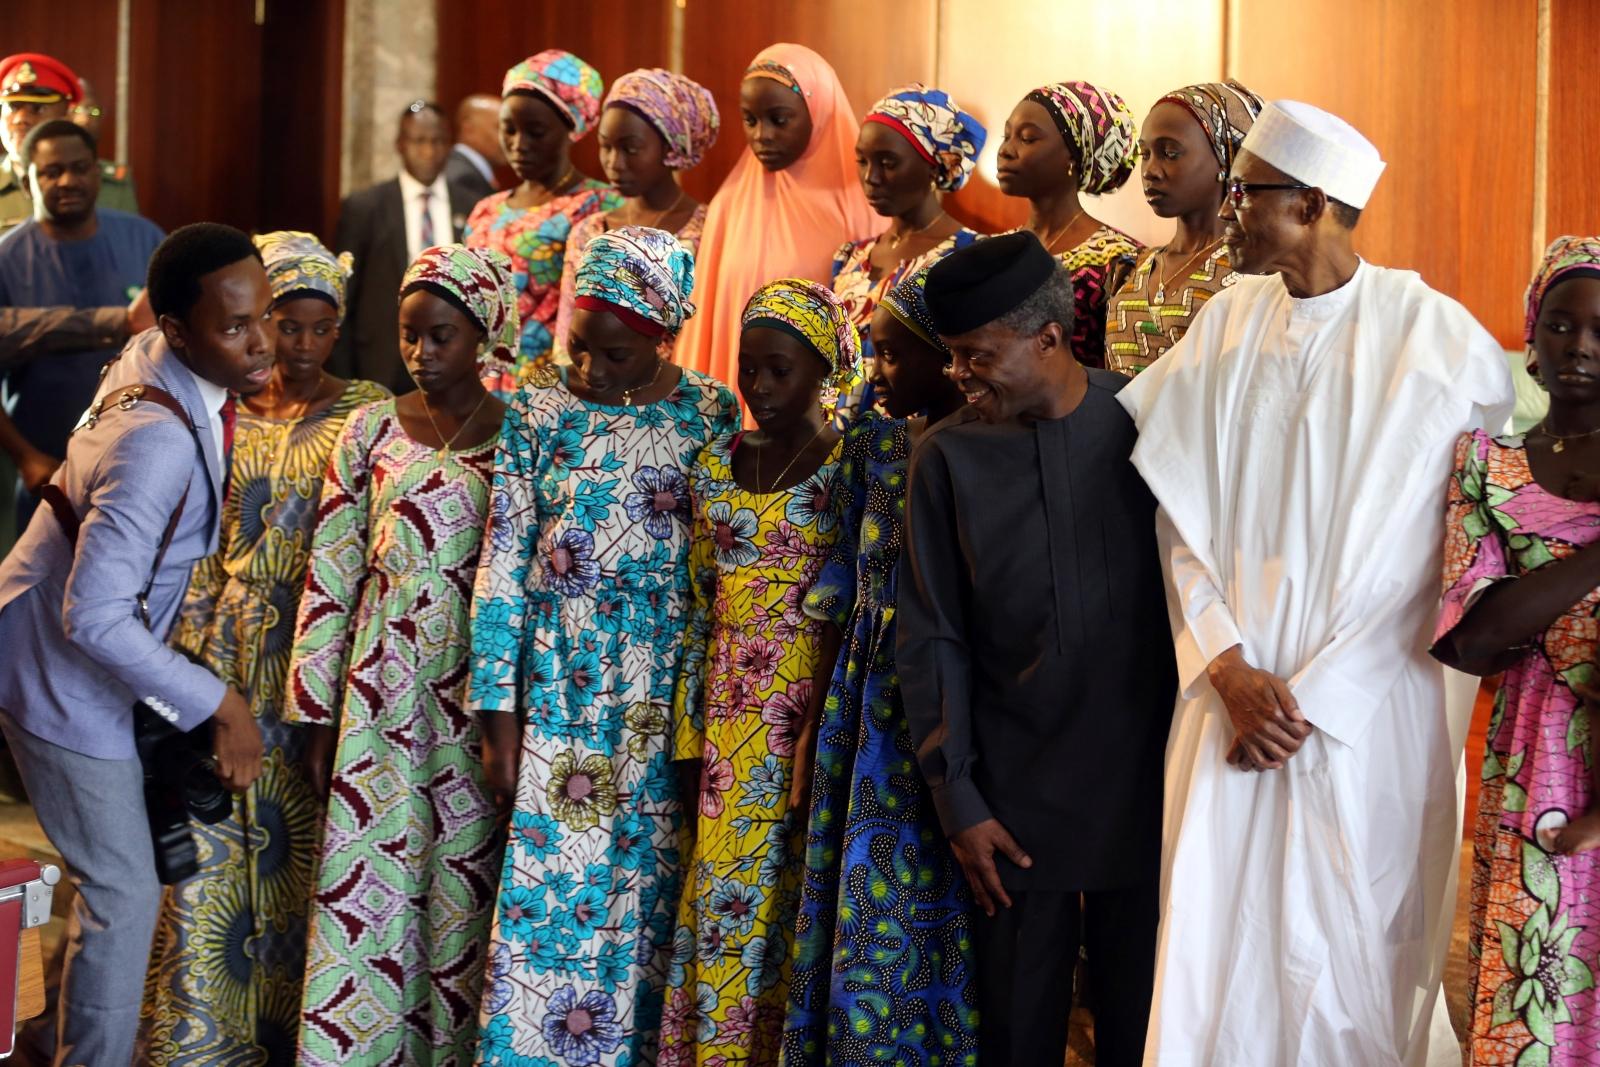 21 Chibok school girls freed by Boko Haram